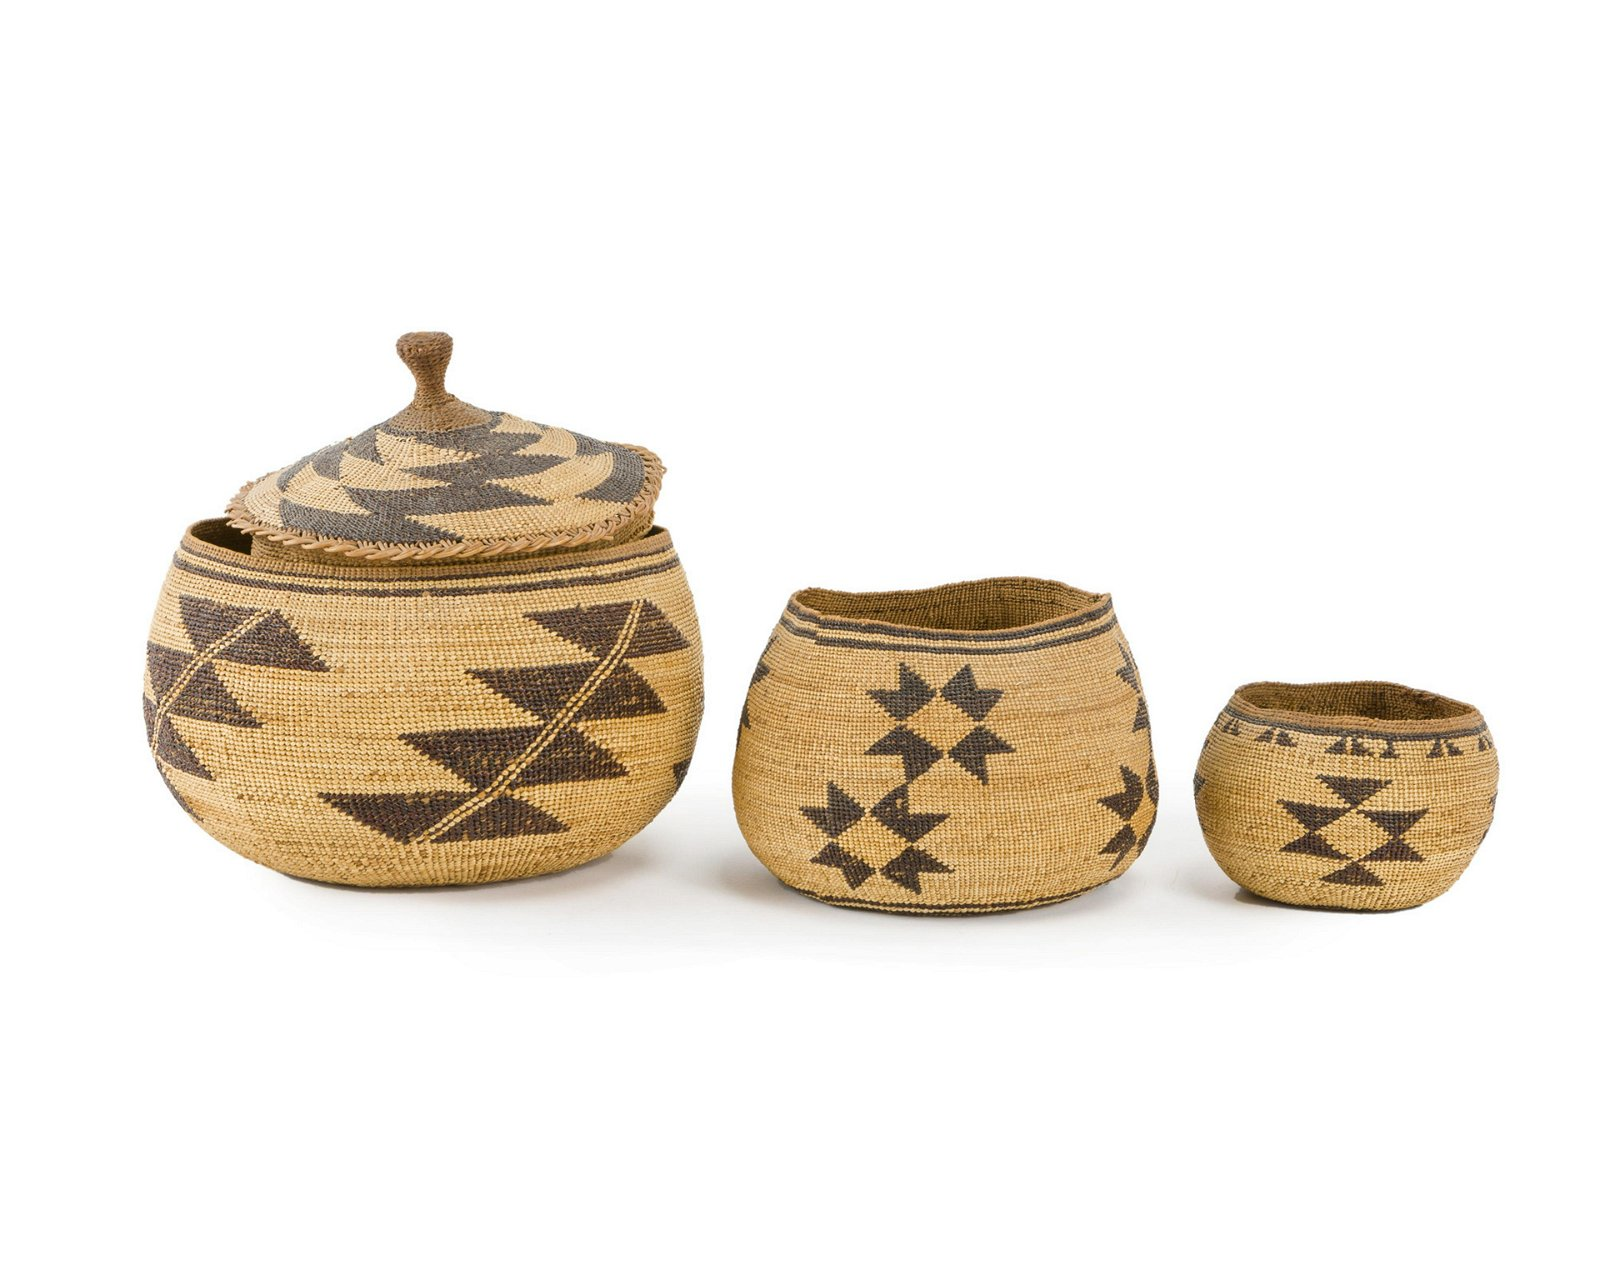 Three Hupa baskets